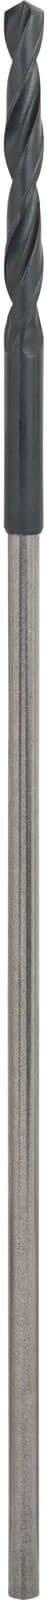 Bosch Extra Length Formwork and Installation Drill 10mm 400mm